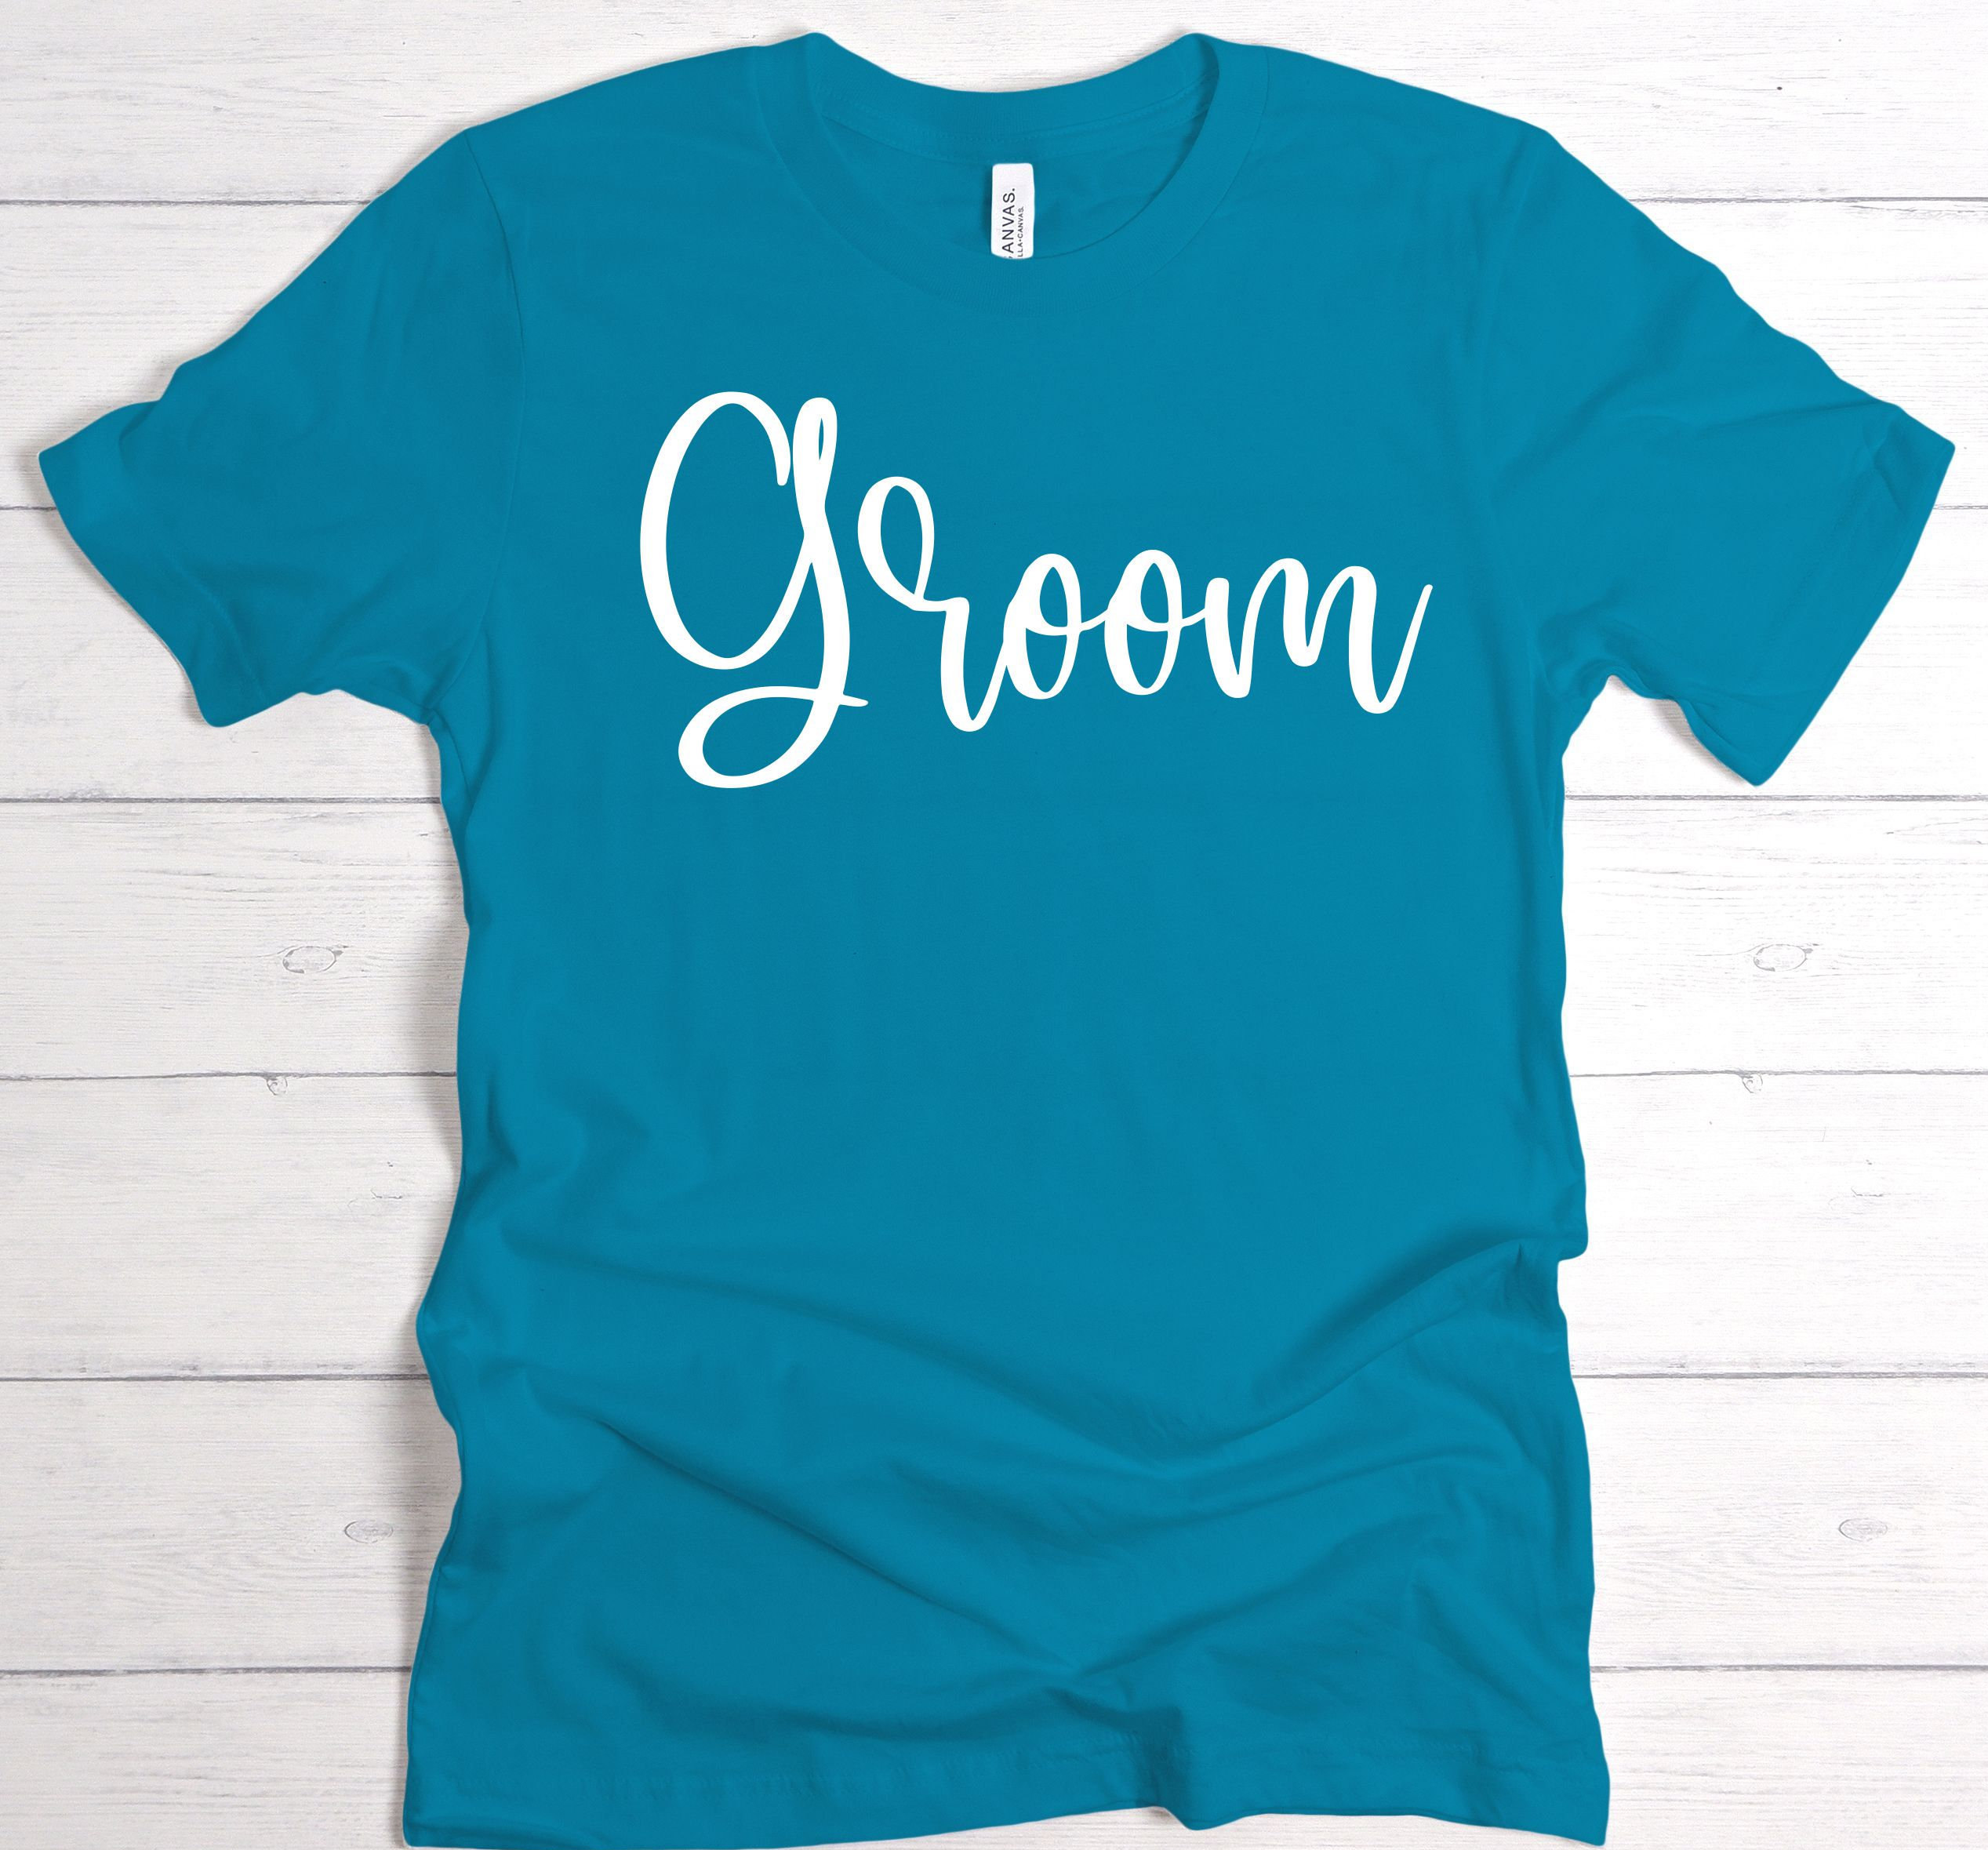 Groom-svg-groomsmen-svg-bride-svg-bachelor-party-svg-bride-svg-wedding-svg-design-bachelorette-svg-design-bridesmaid-cricut-svg-2-600a14cb